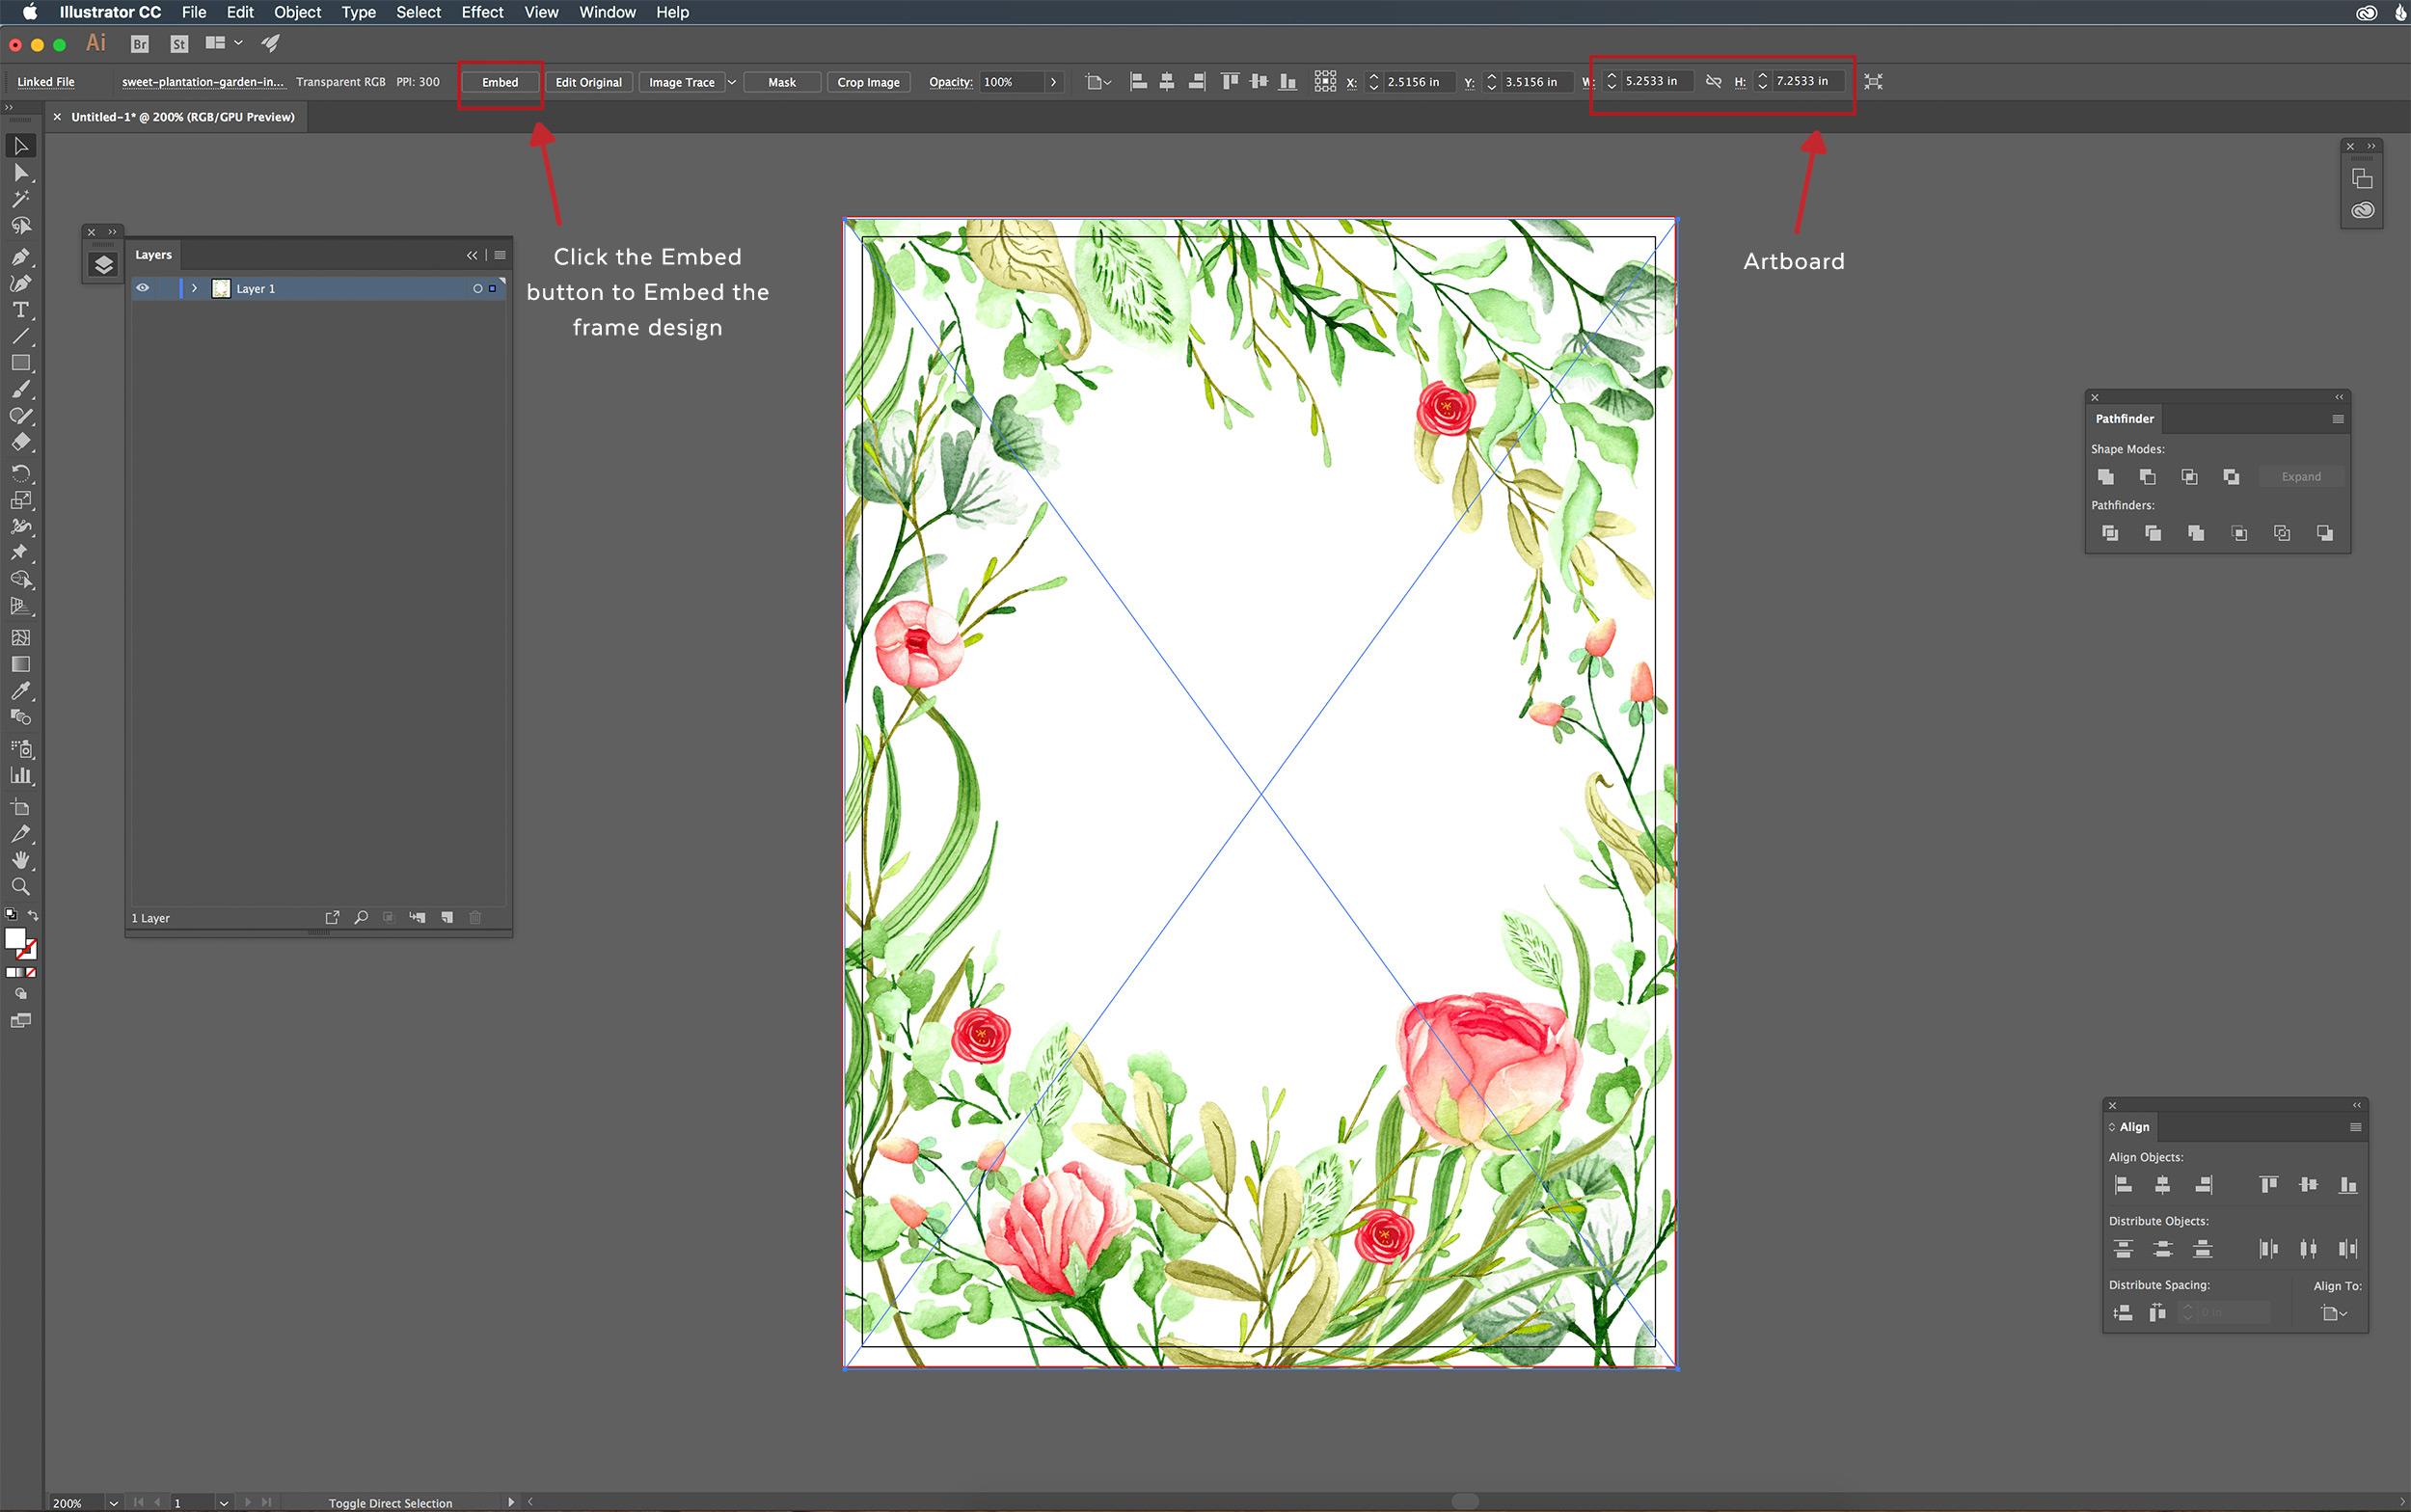 design-invitation-illustrator-tutorial-clip-art-graphics